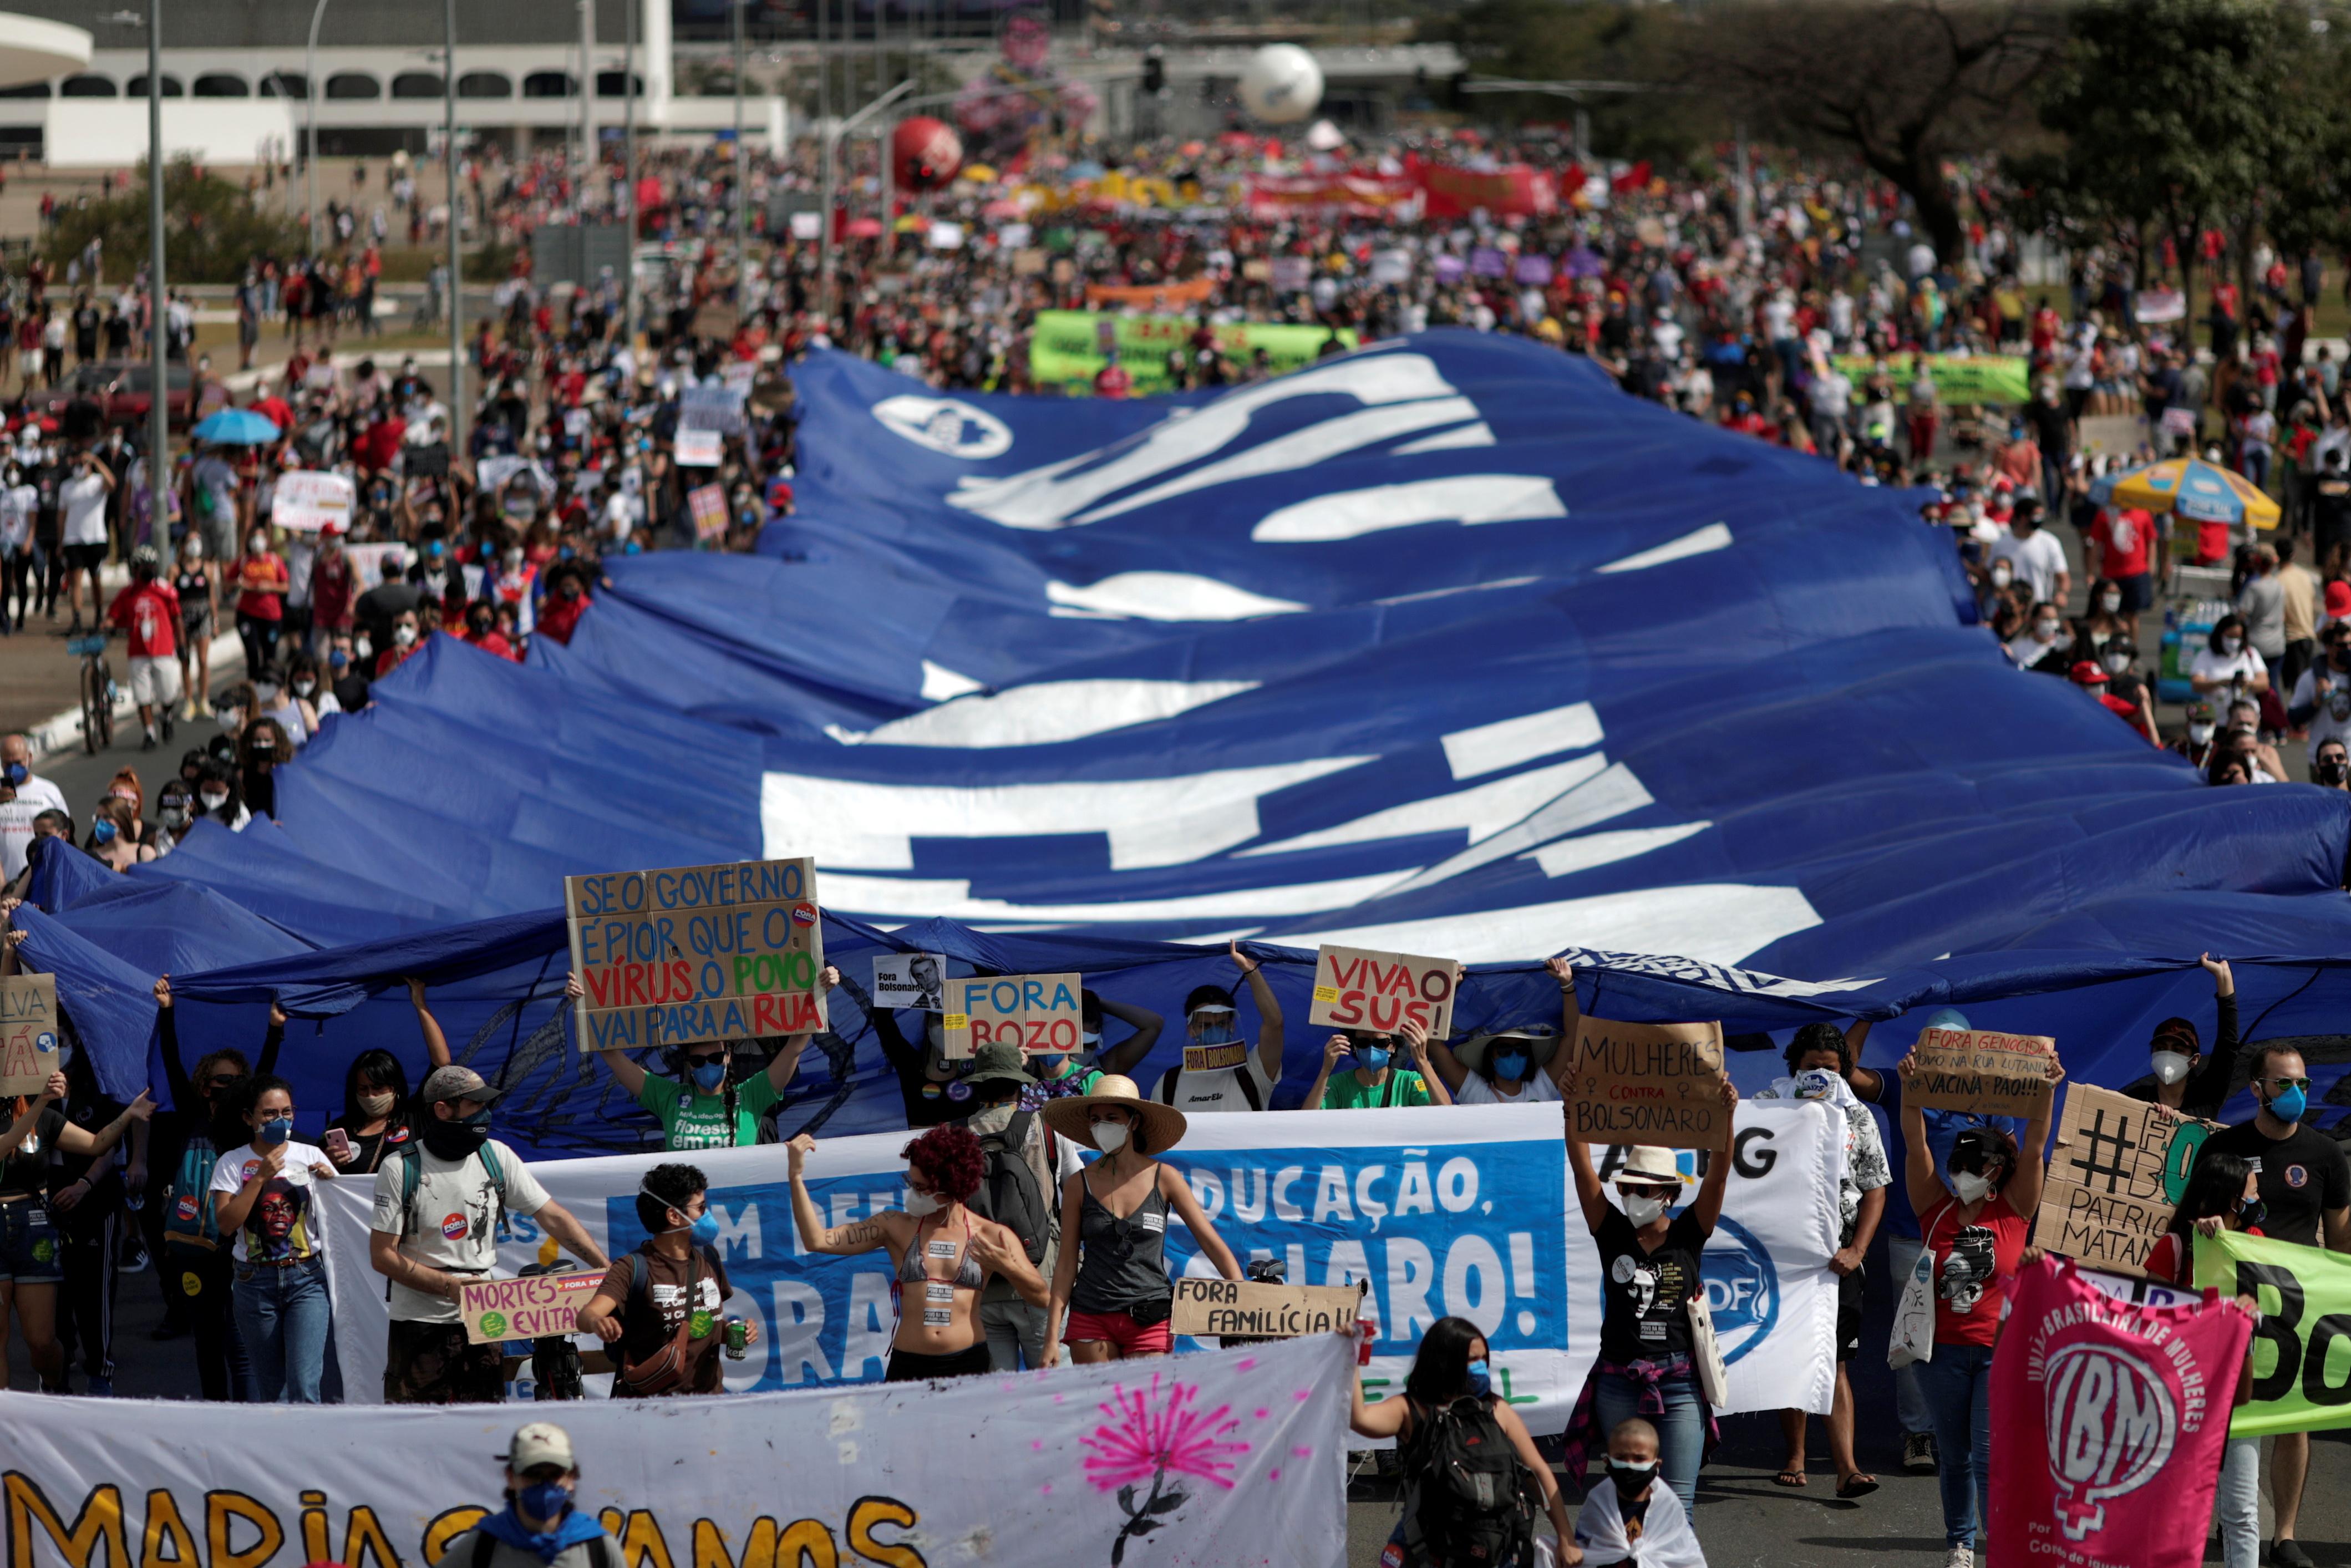 Brazilians Stage Nationwide Protests Against President Bolsonaro's Coronavirus Response